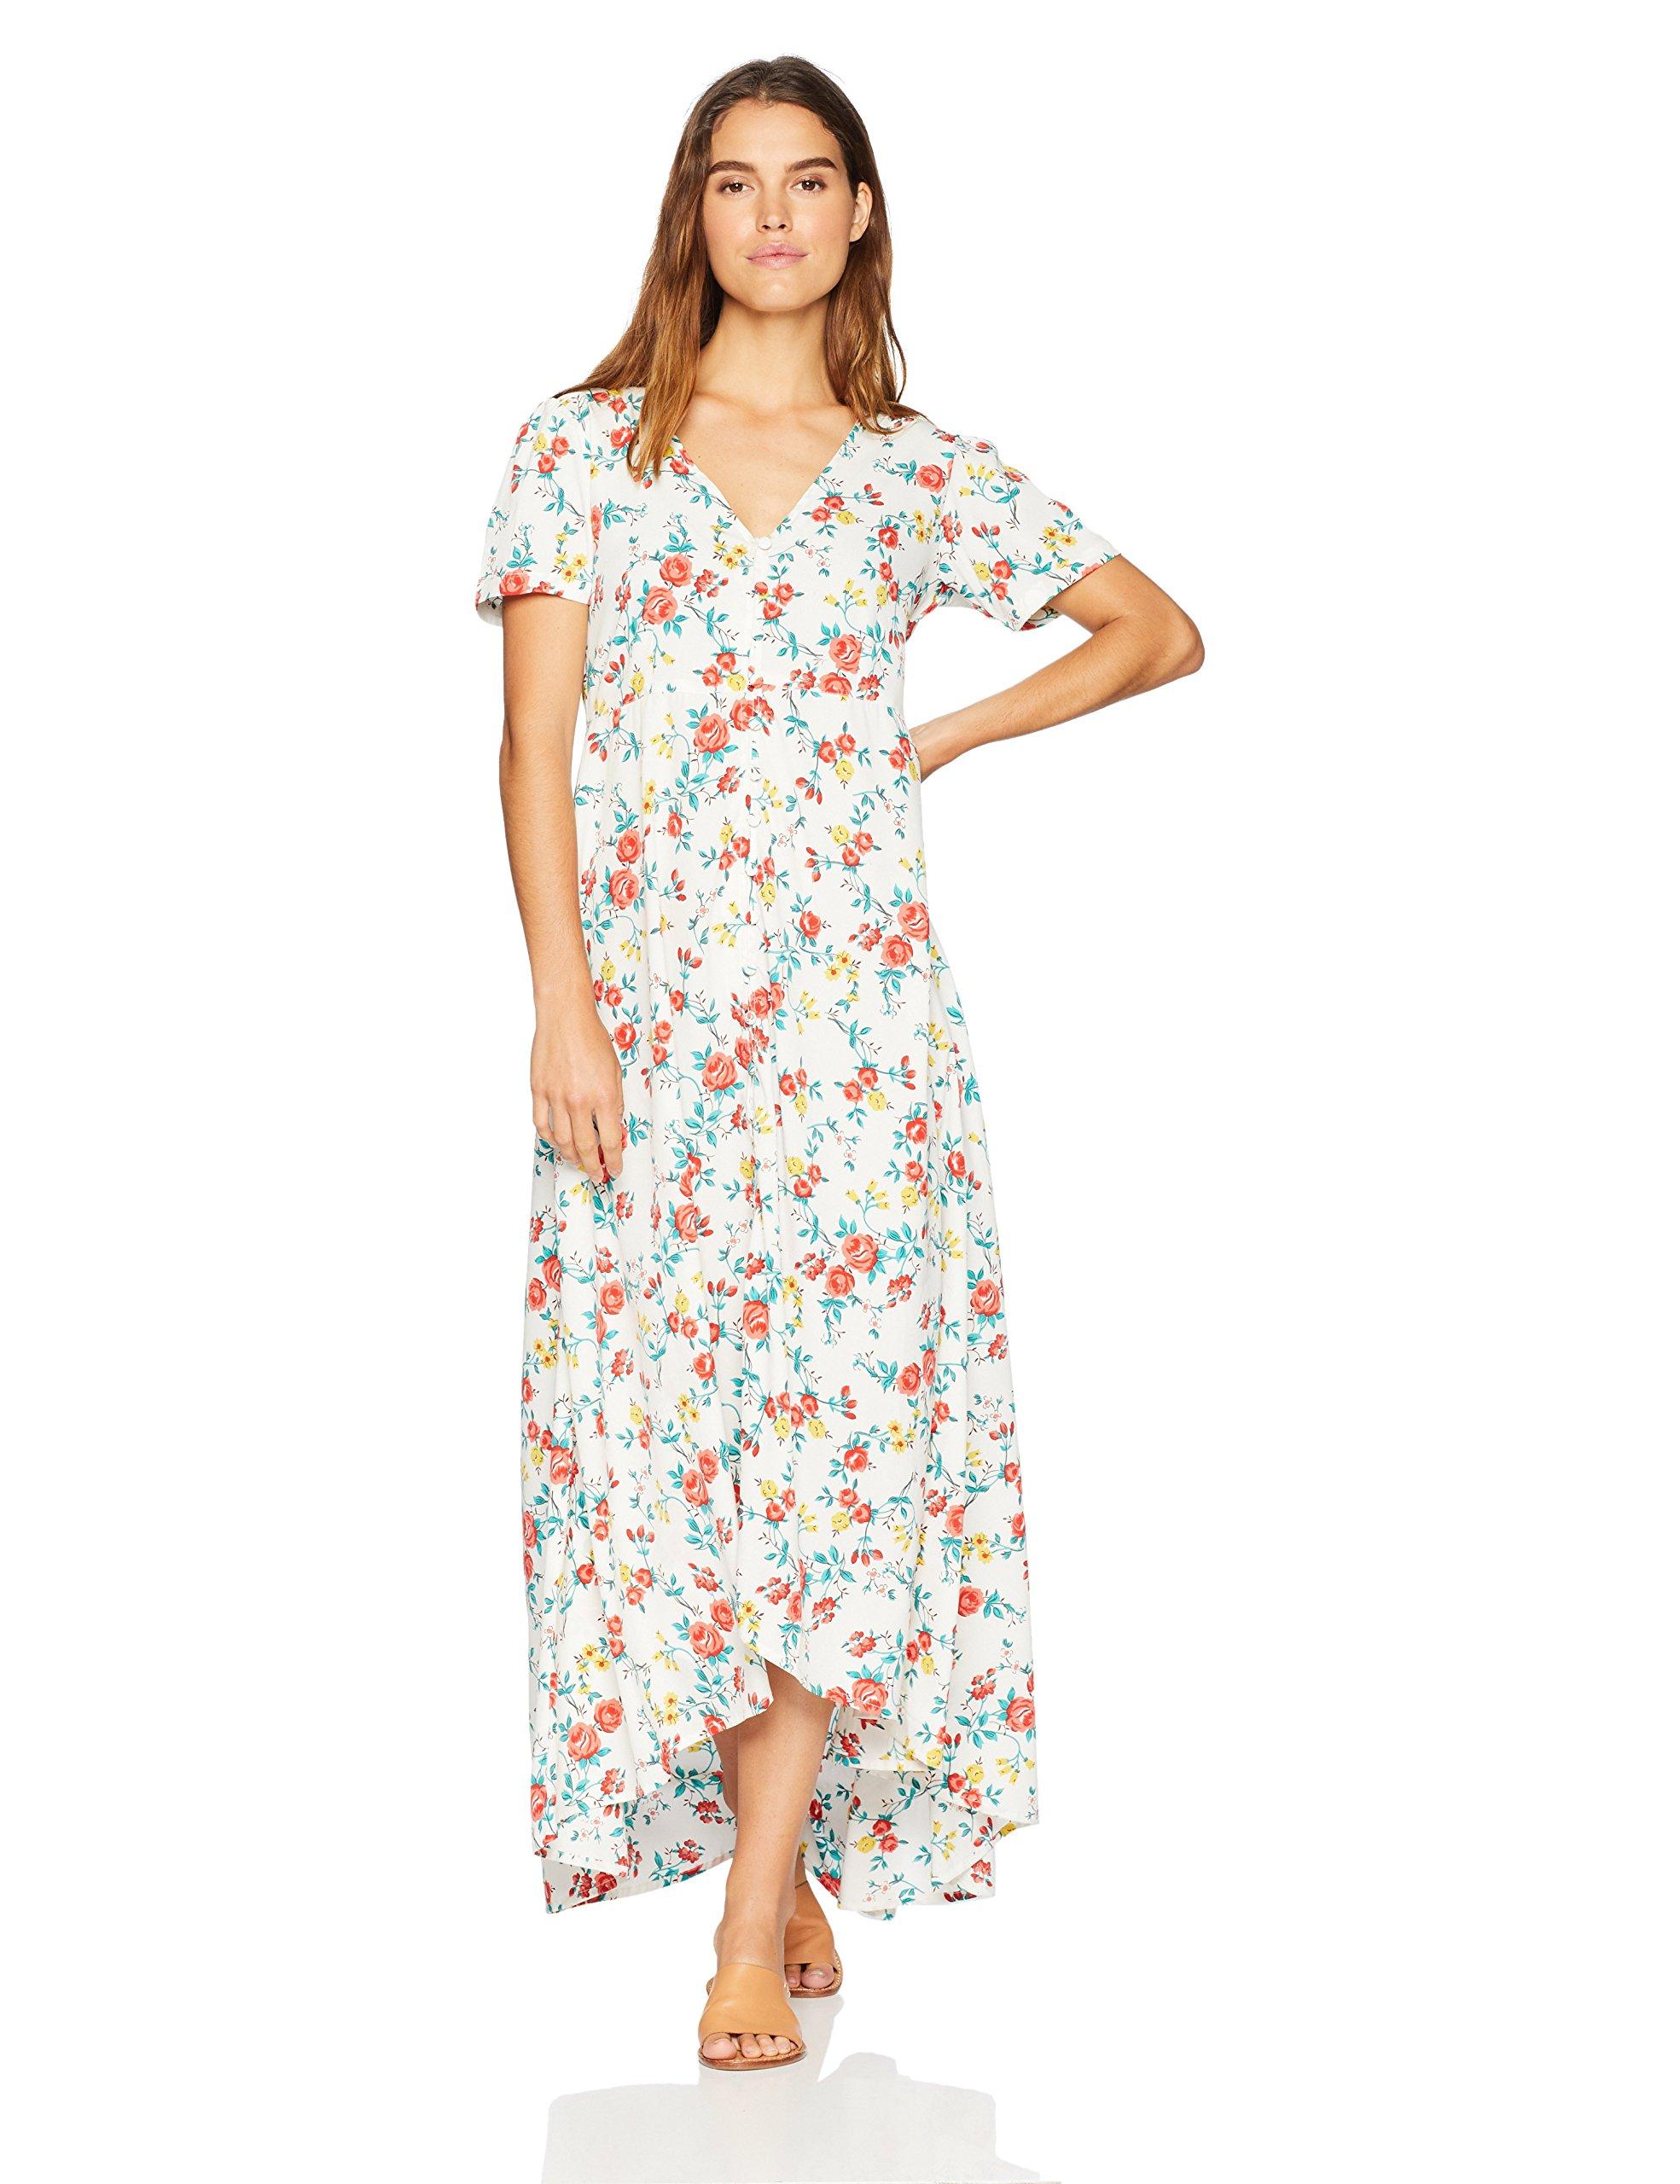 c64e7c0b8b Wild Oasis Beachwear Women's Short Sleeves Floral Printed Maxi Dress with  Button Detailing & Slit X-Large White